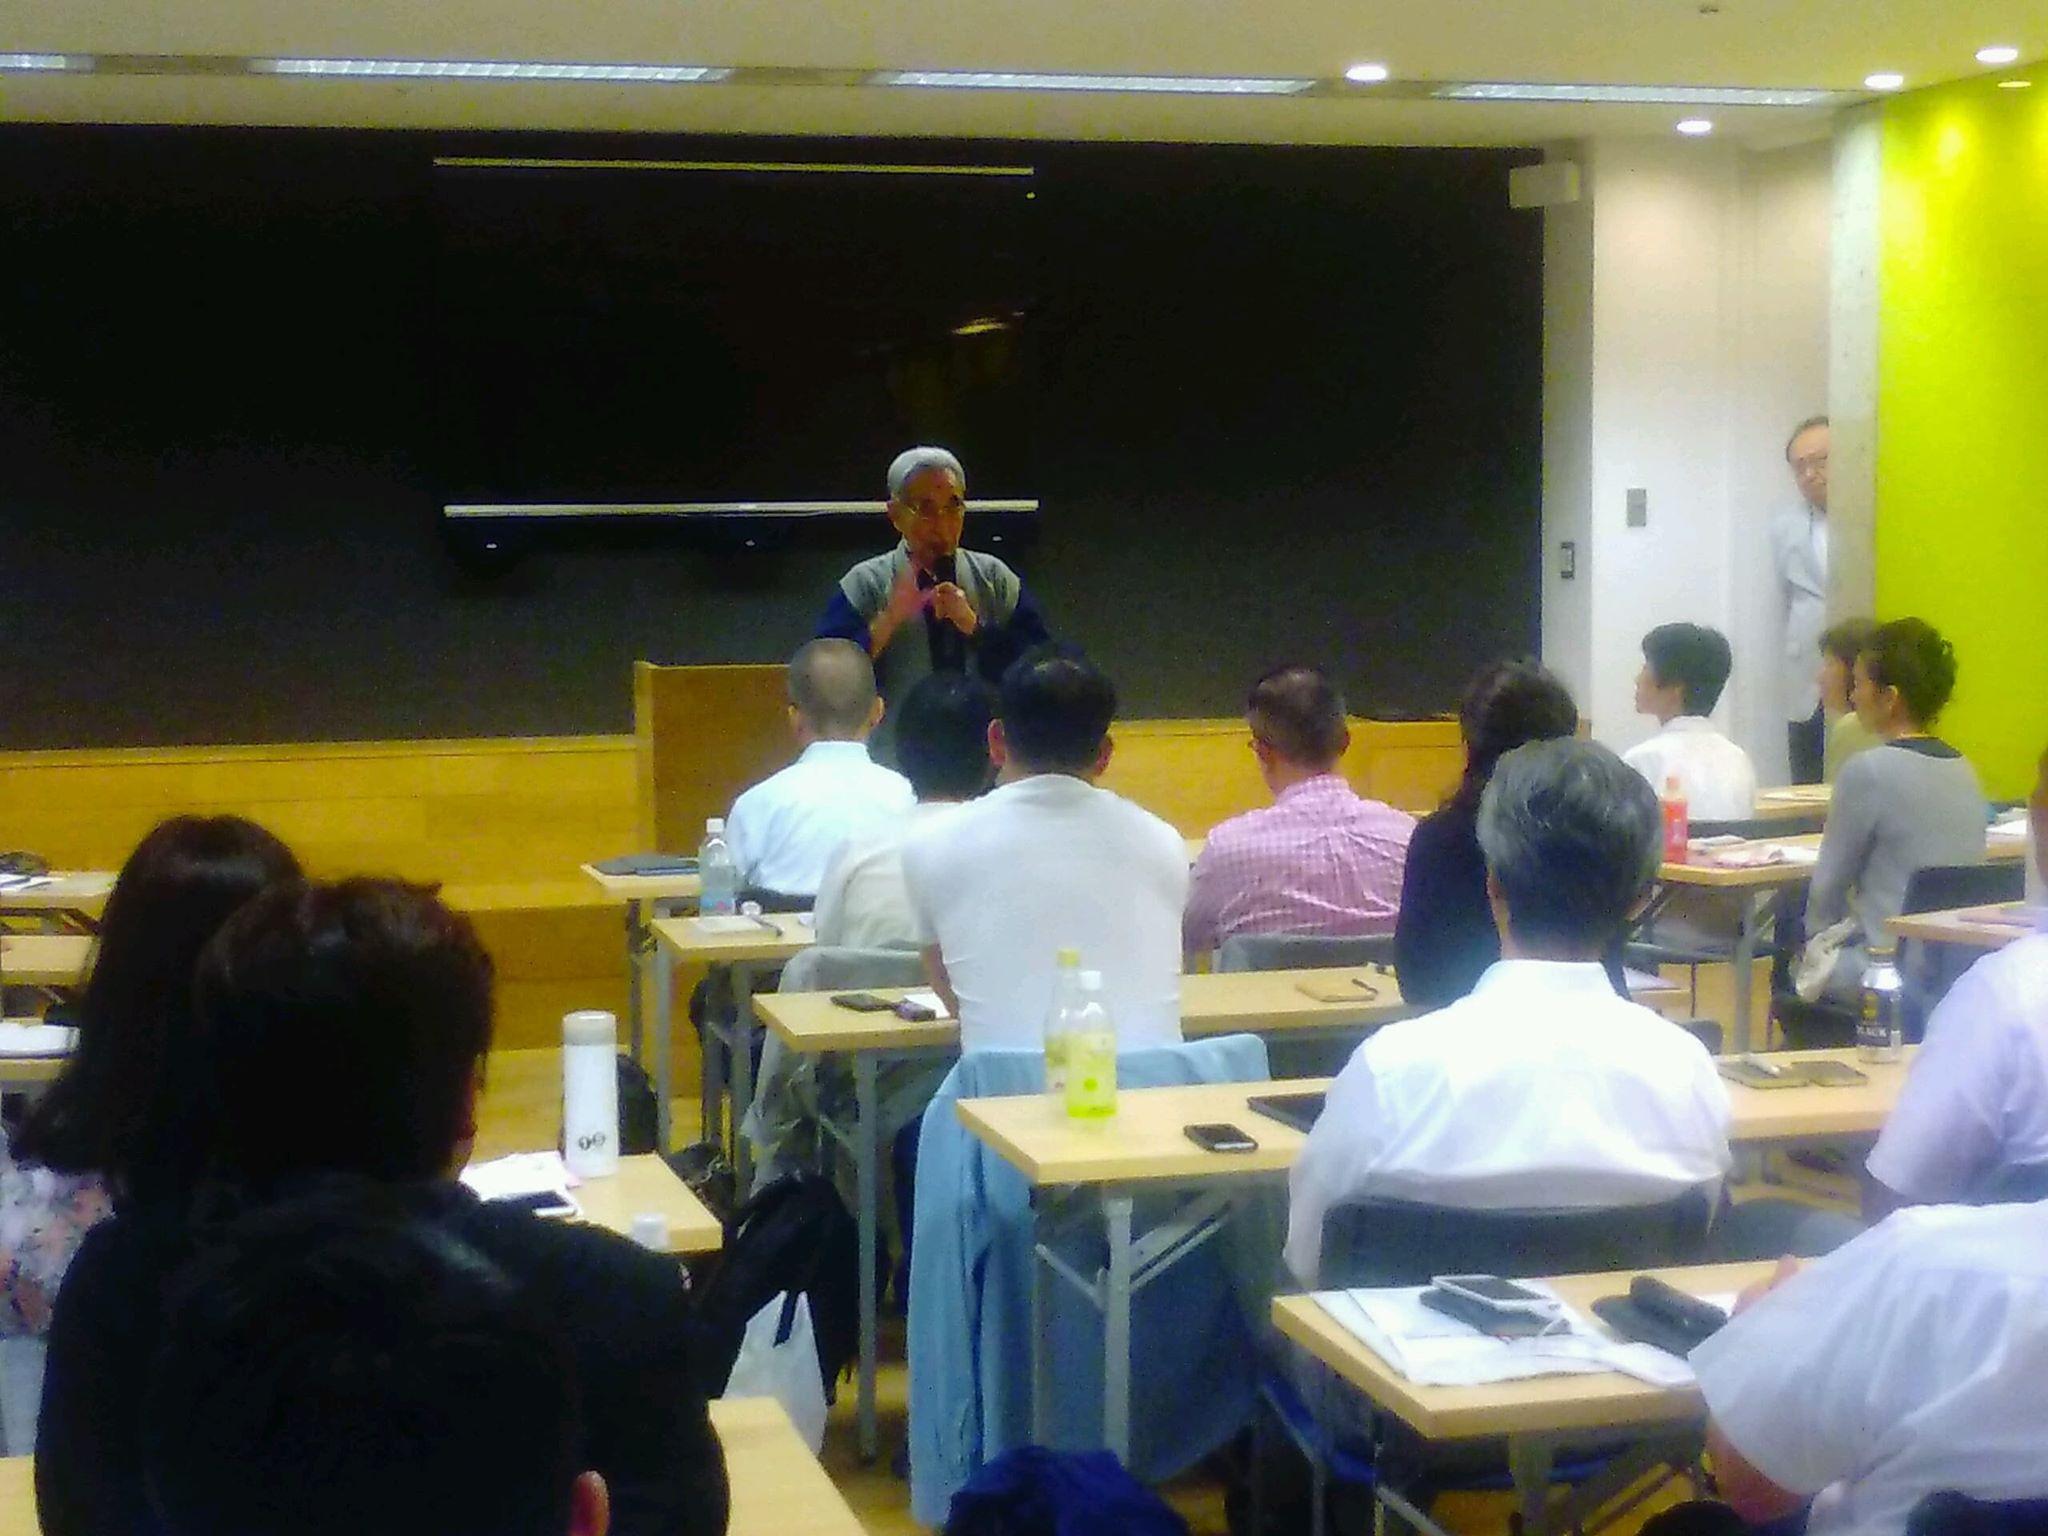 43305511 239985183346439 5922354709674328064 n - 2018年10月6日(土)第5回東京思風塾開催しました。